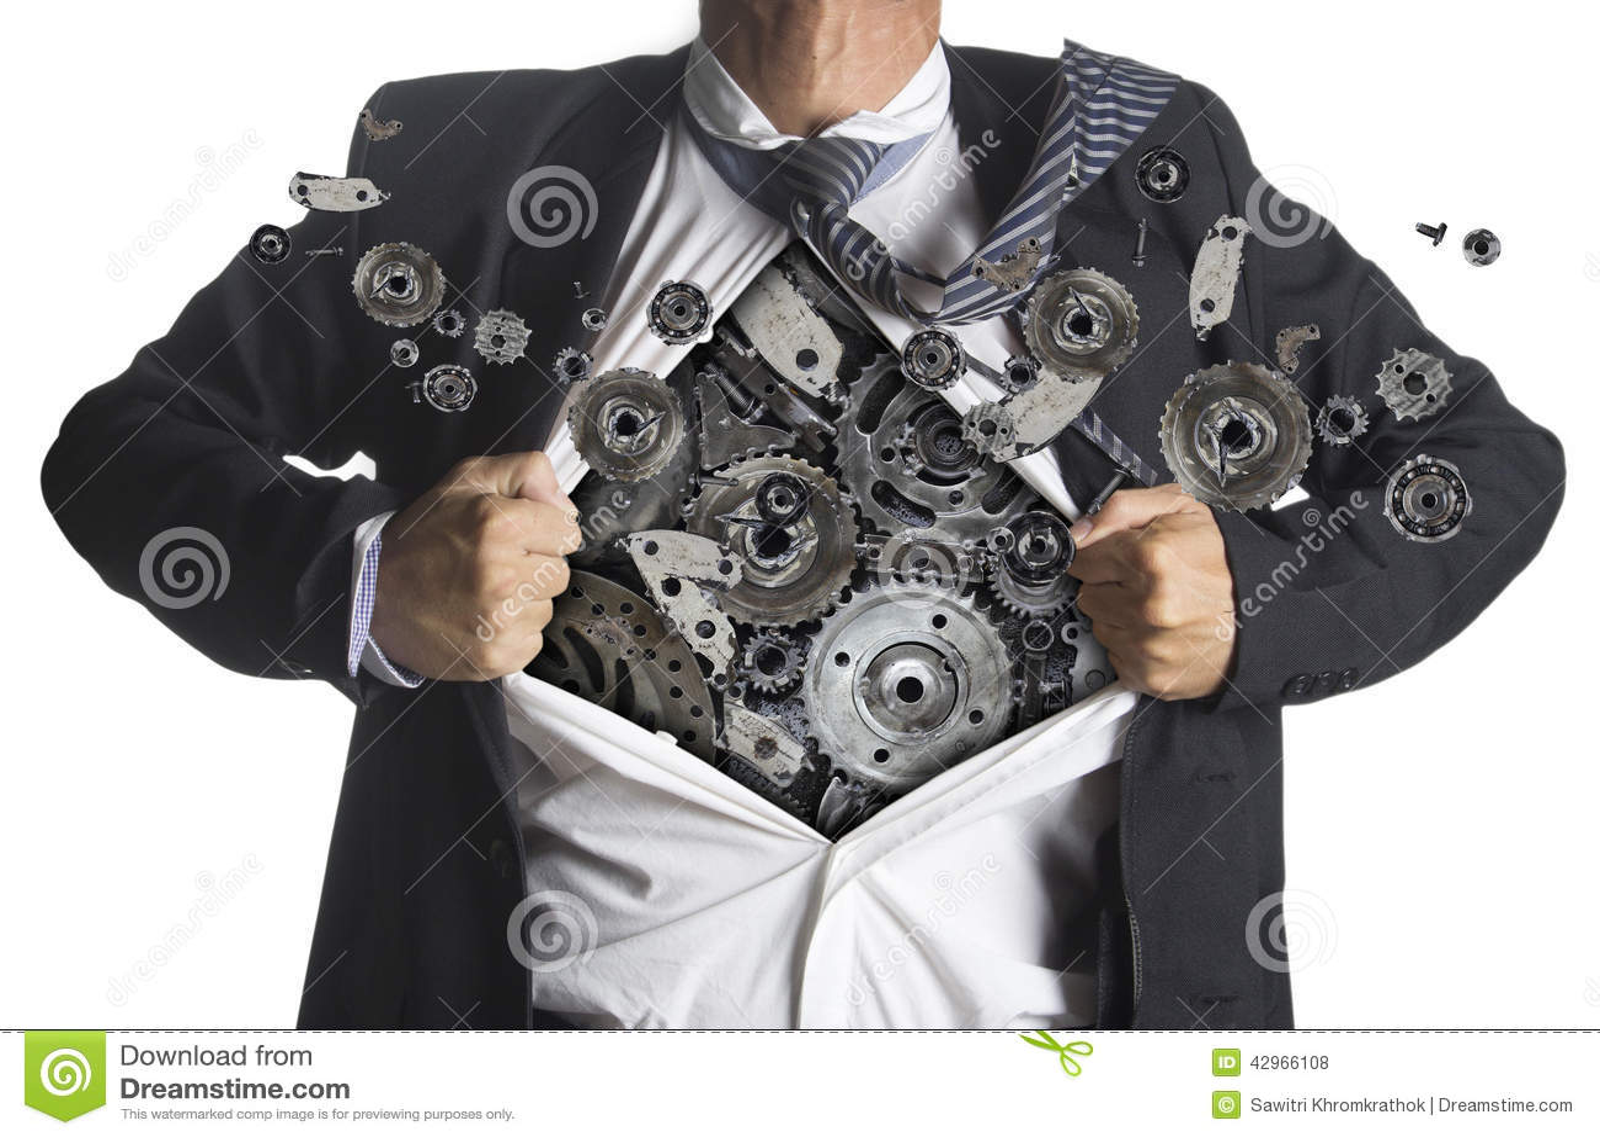 Businessman showing a superhero suit underneath machinery